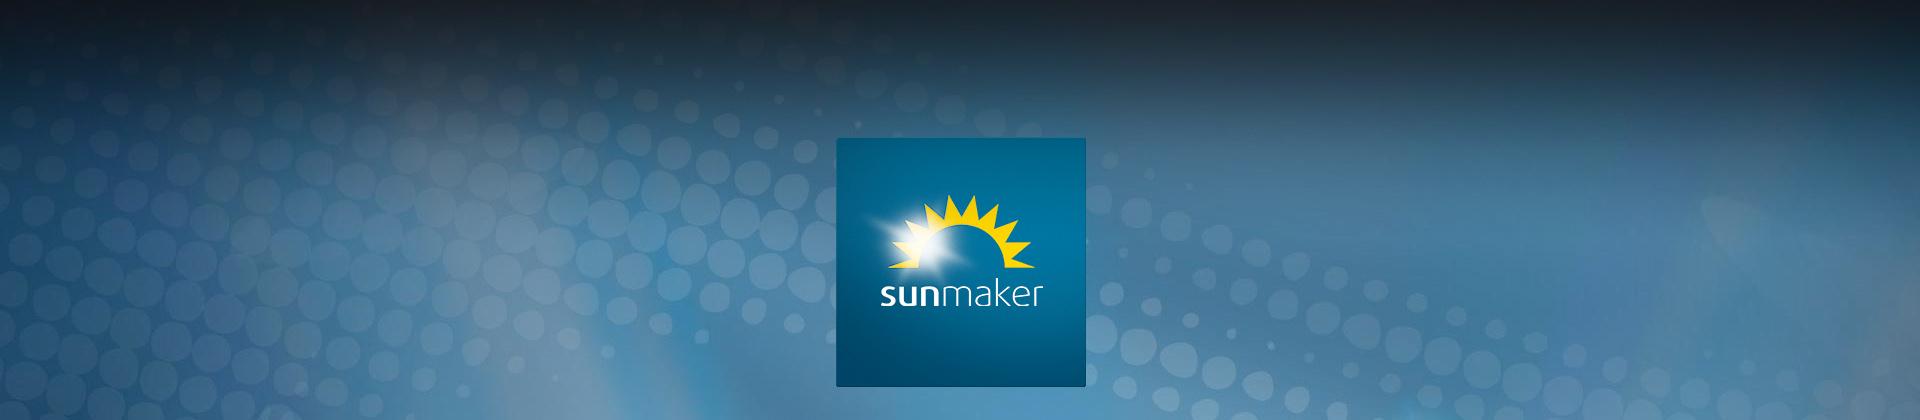 sunmaker-spielautomaten-1